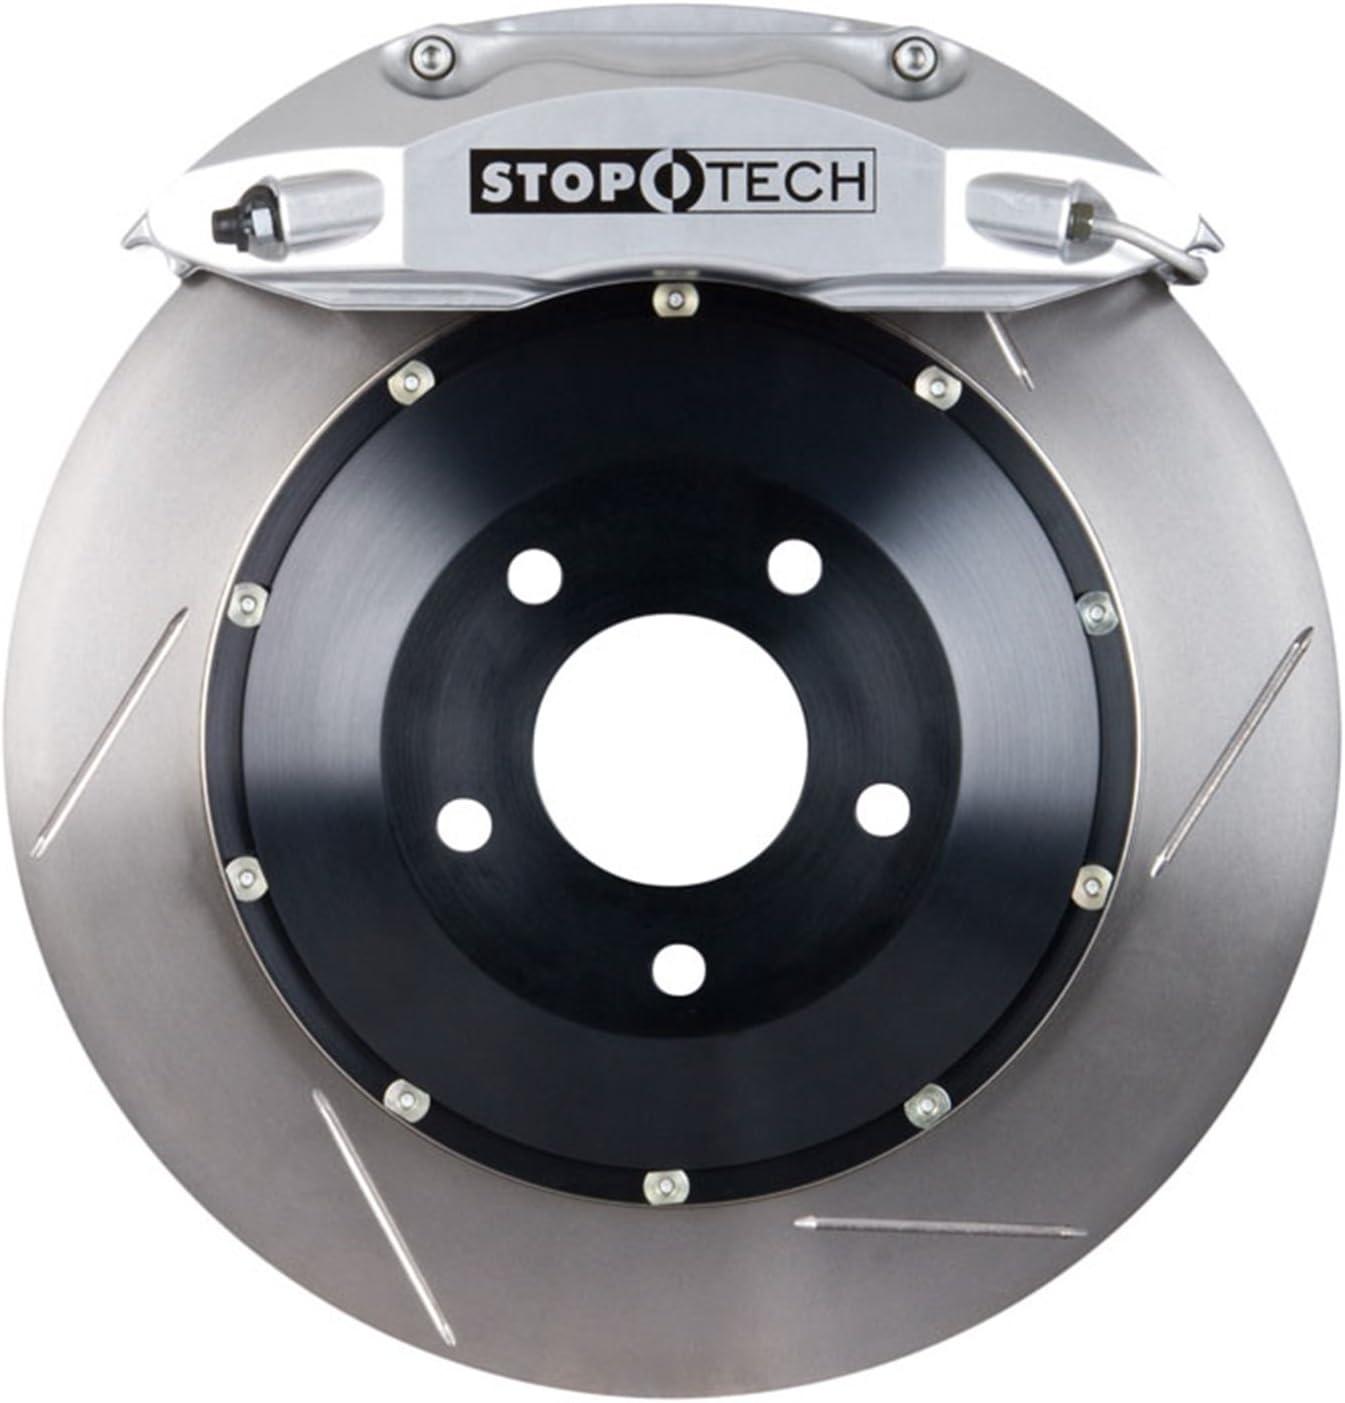 Nippon regular agency StopTech 83.112.4700.61 Same day shipping Big Brake Rotor Front Kit Piece 2 1